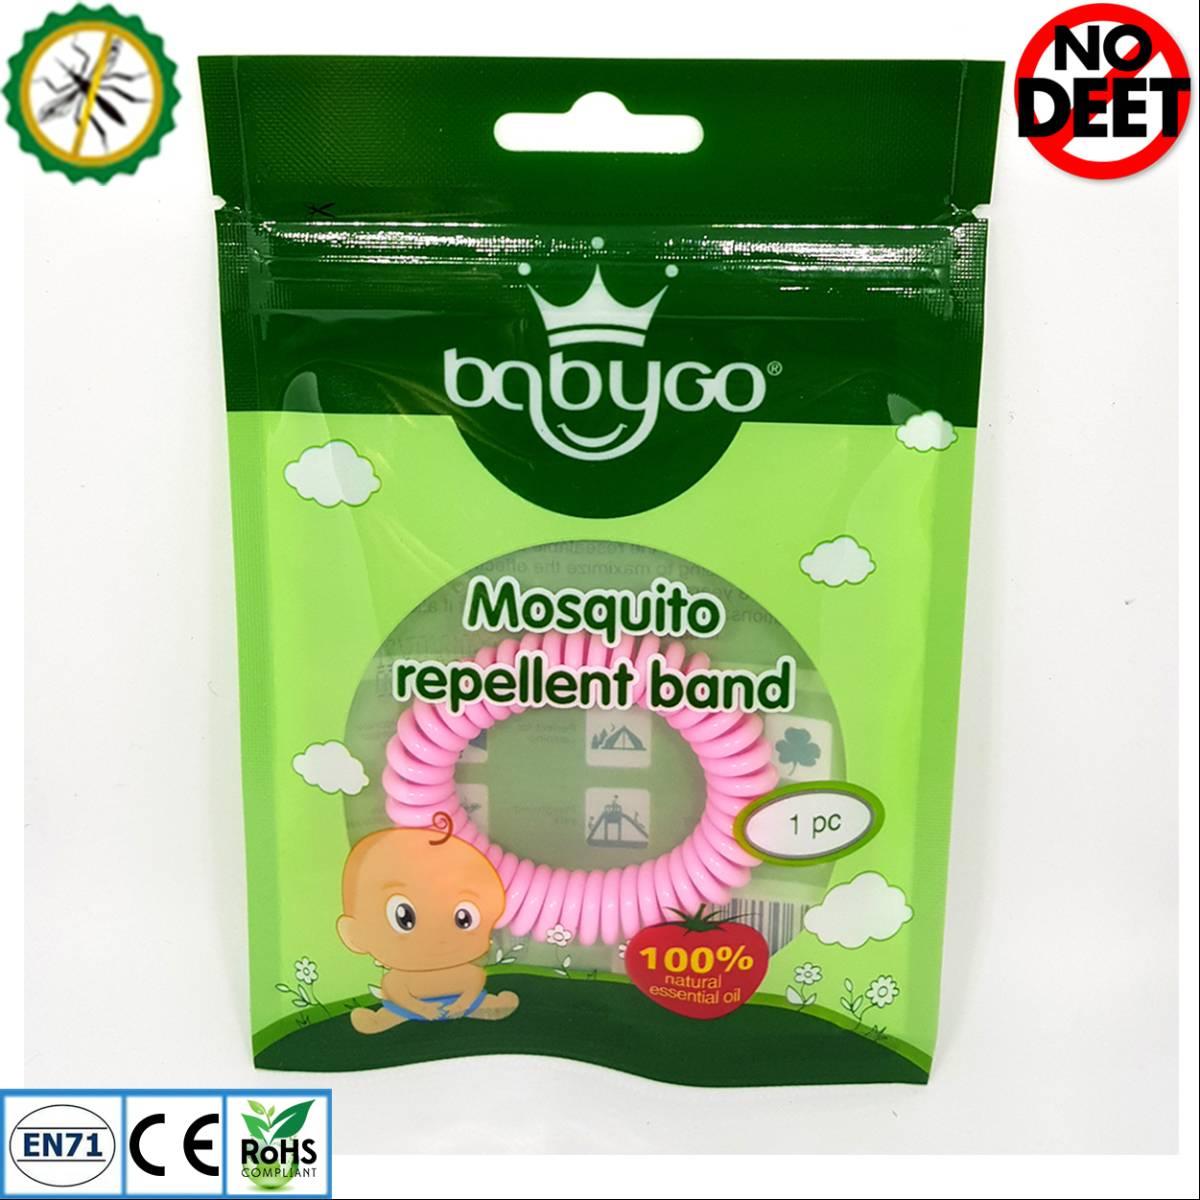 Babygo Spiral Band Mosquito Repellent (gelang Anti Nyamuk Spiral)4